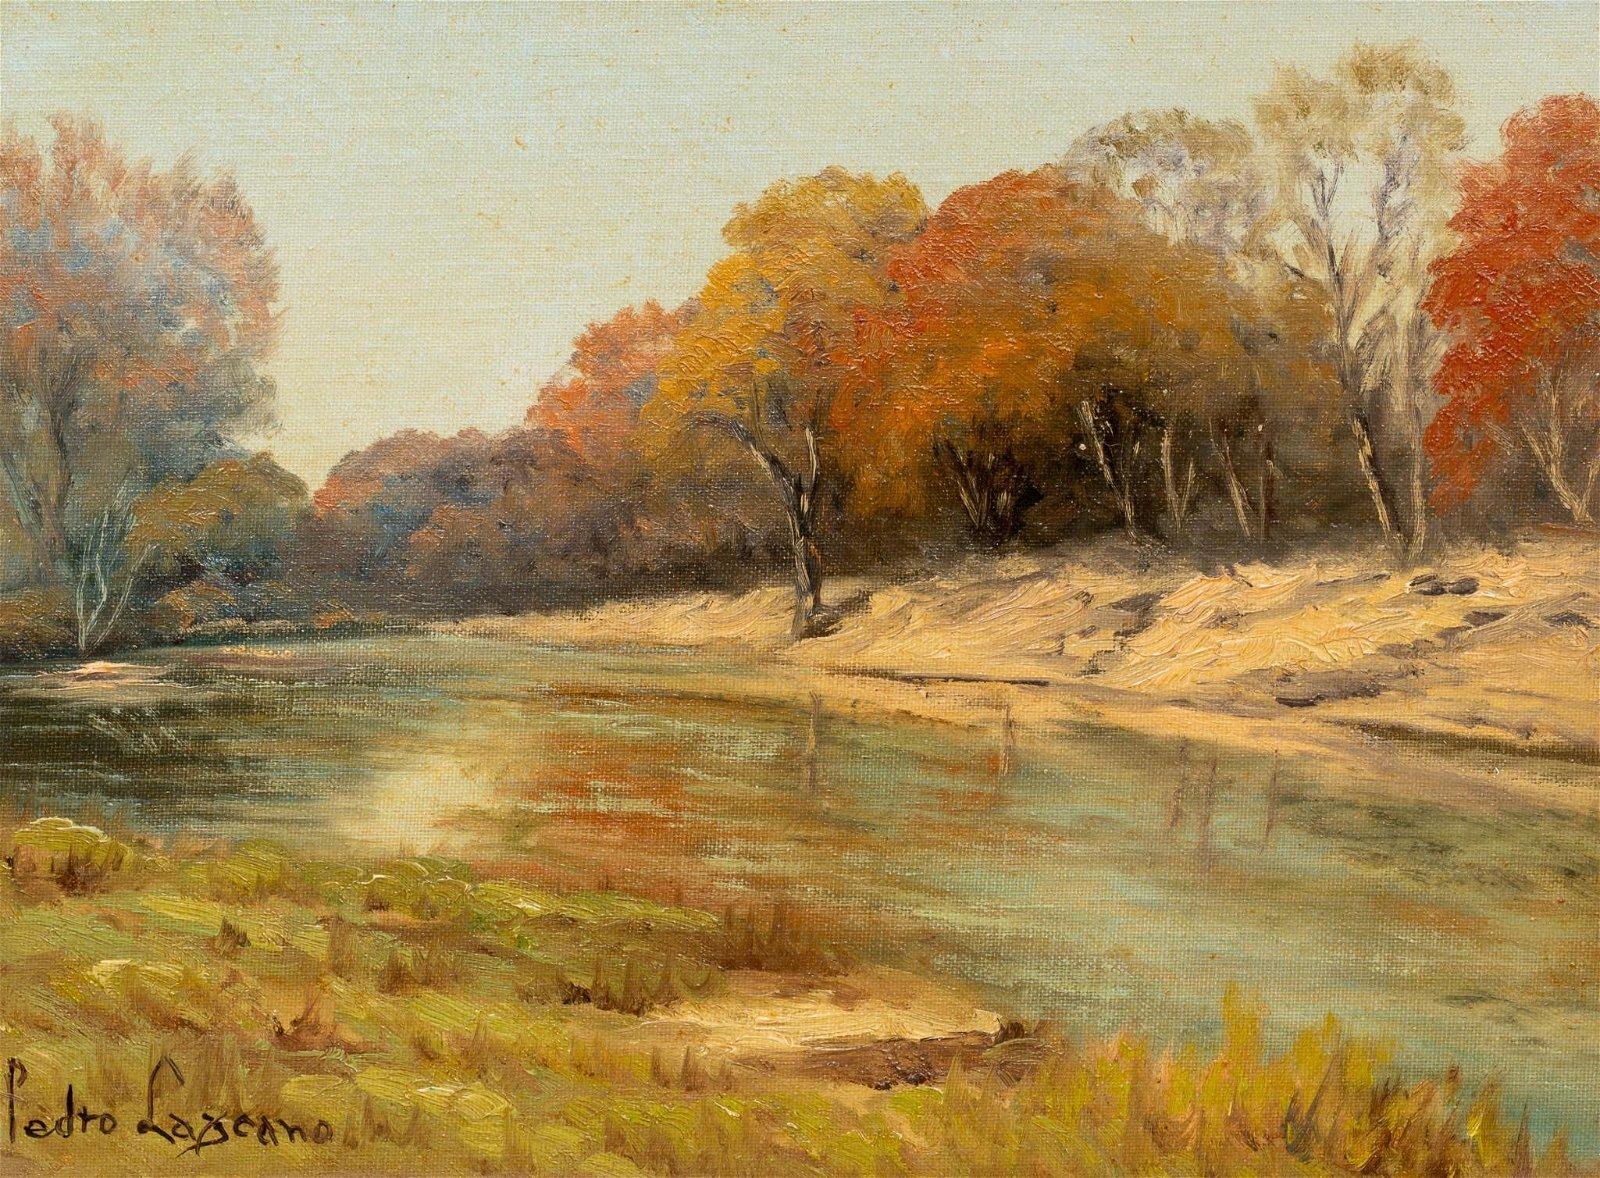 Pedro Lazcano (1909-1973), River Scene, oil